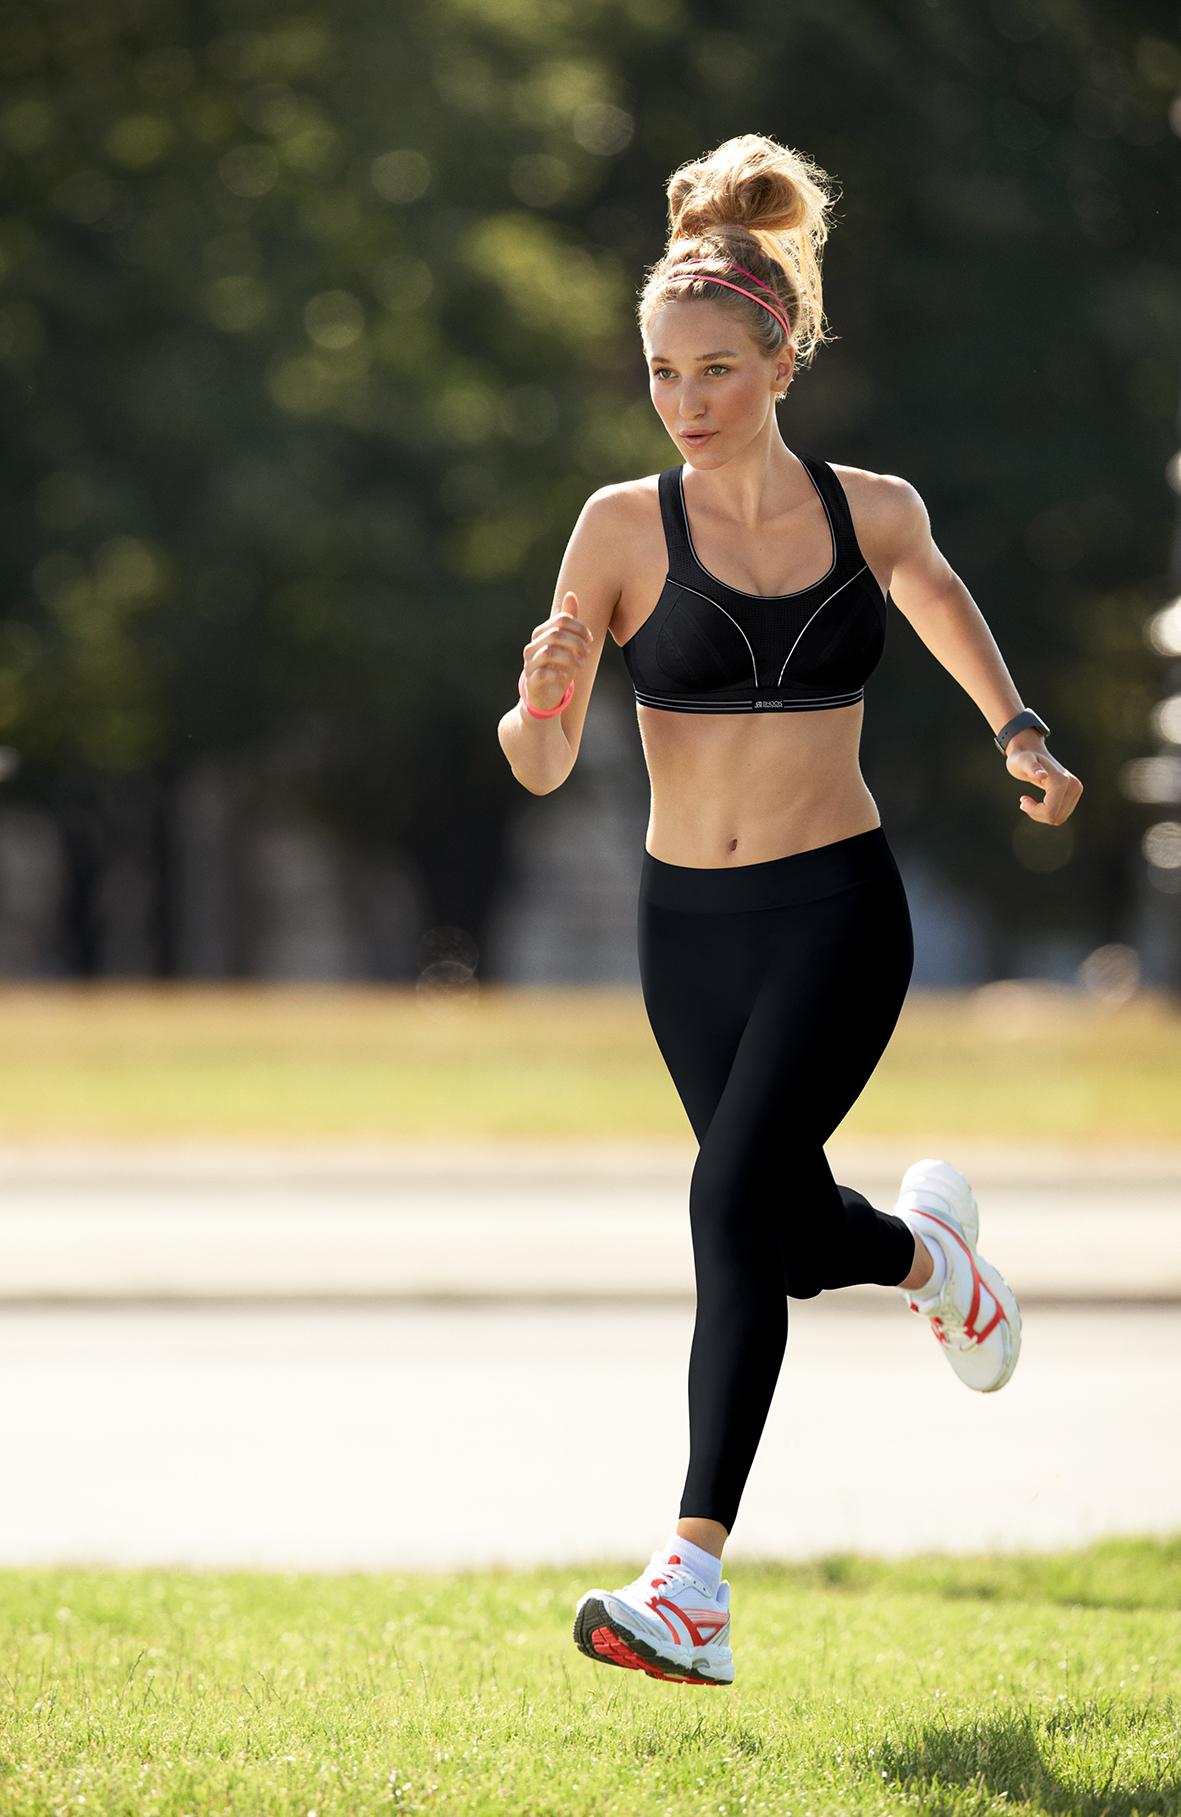 5044 RUN Black Running_Lifestyle